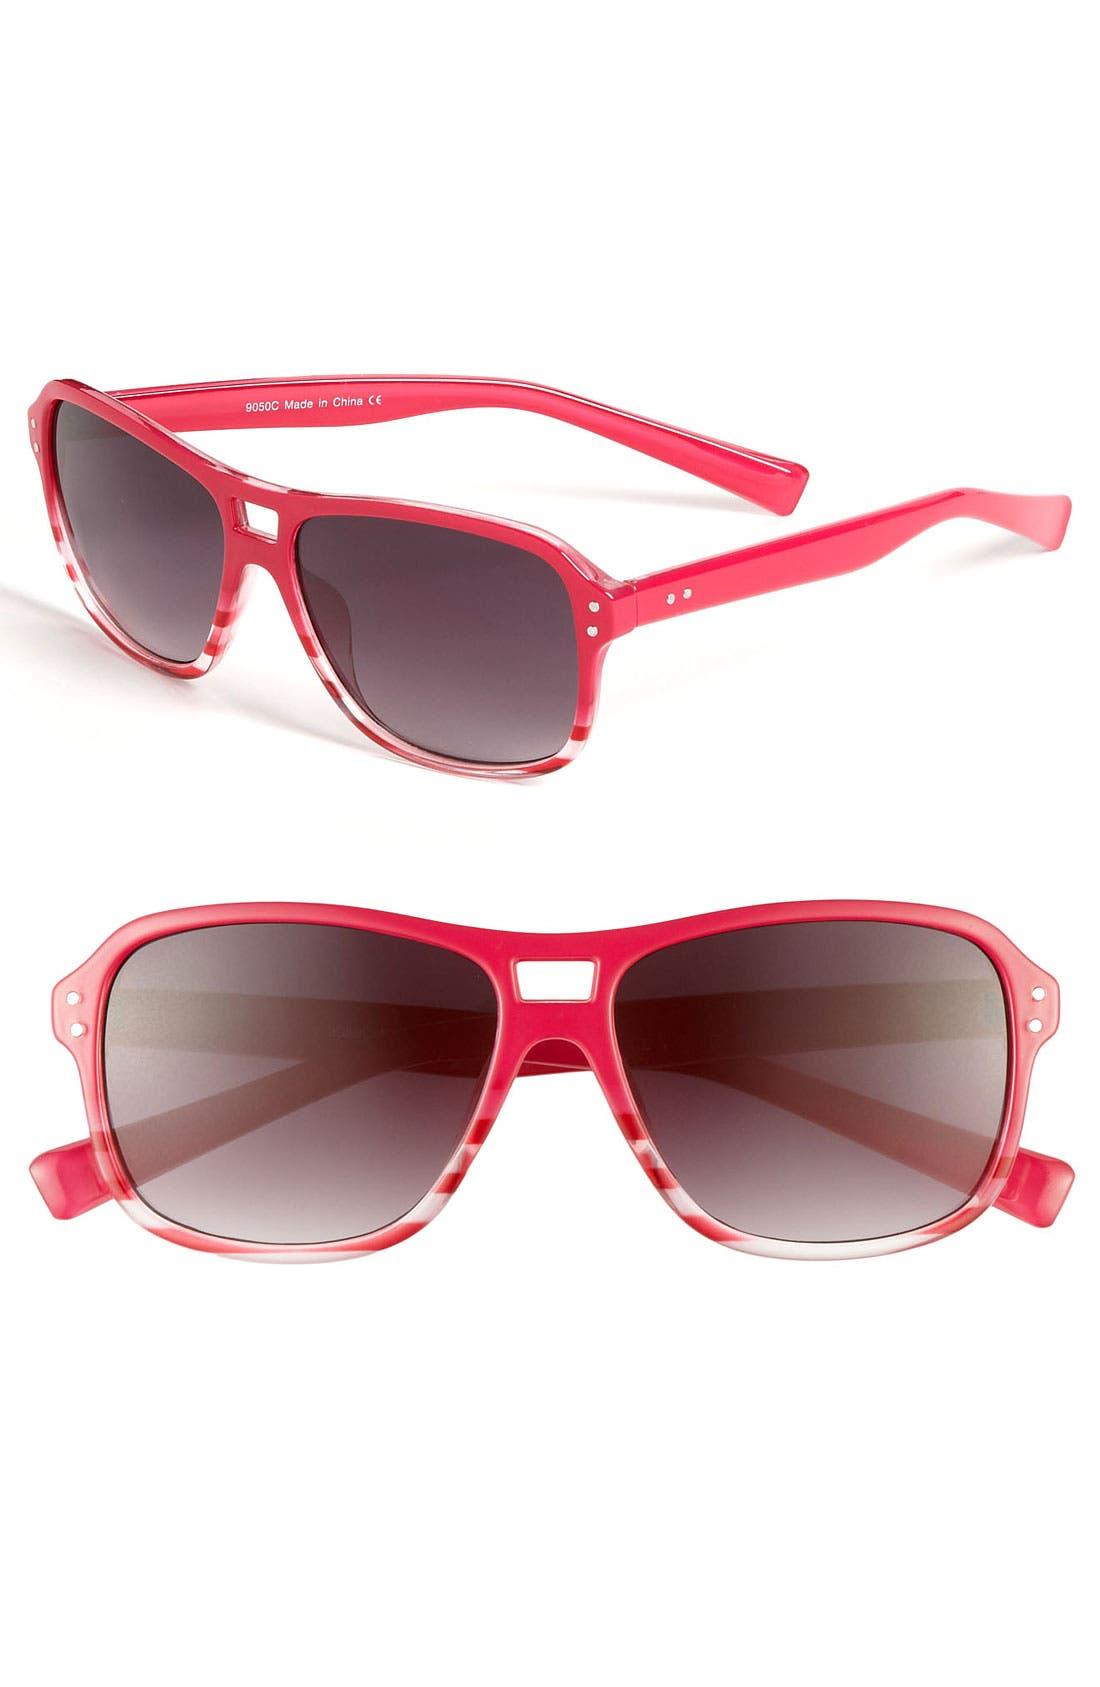 Alternate Image 1 Selected - KW 'Everest' Sunglasses